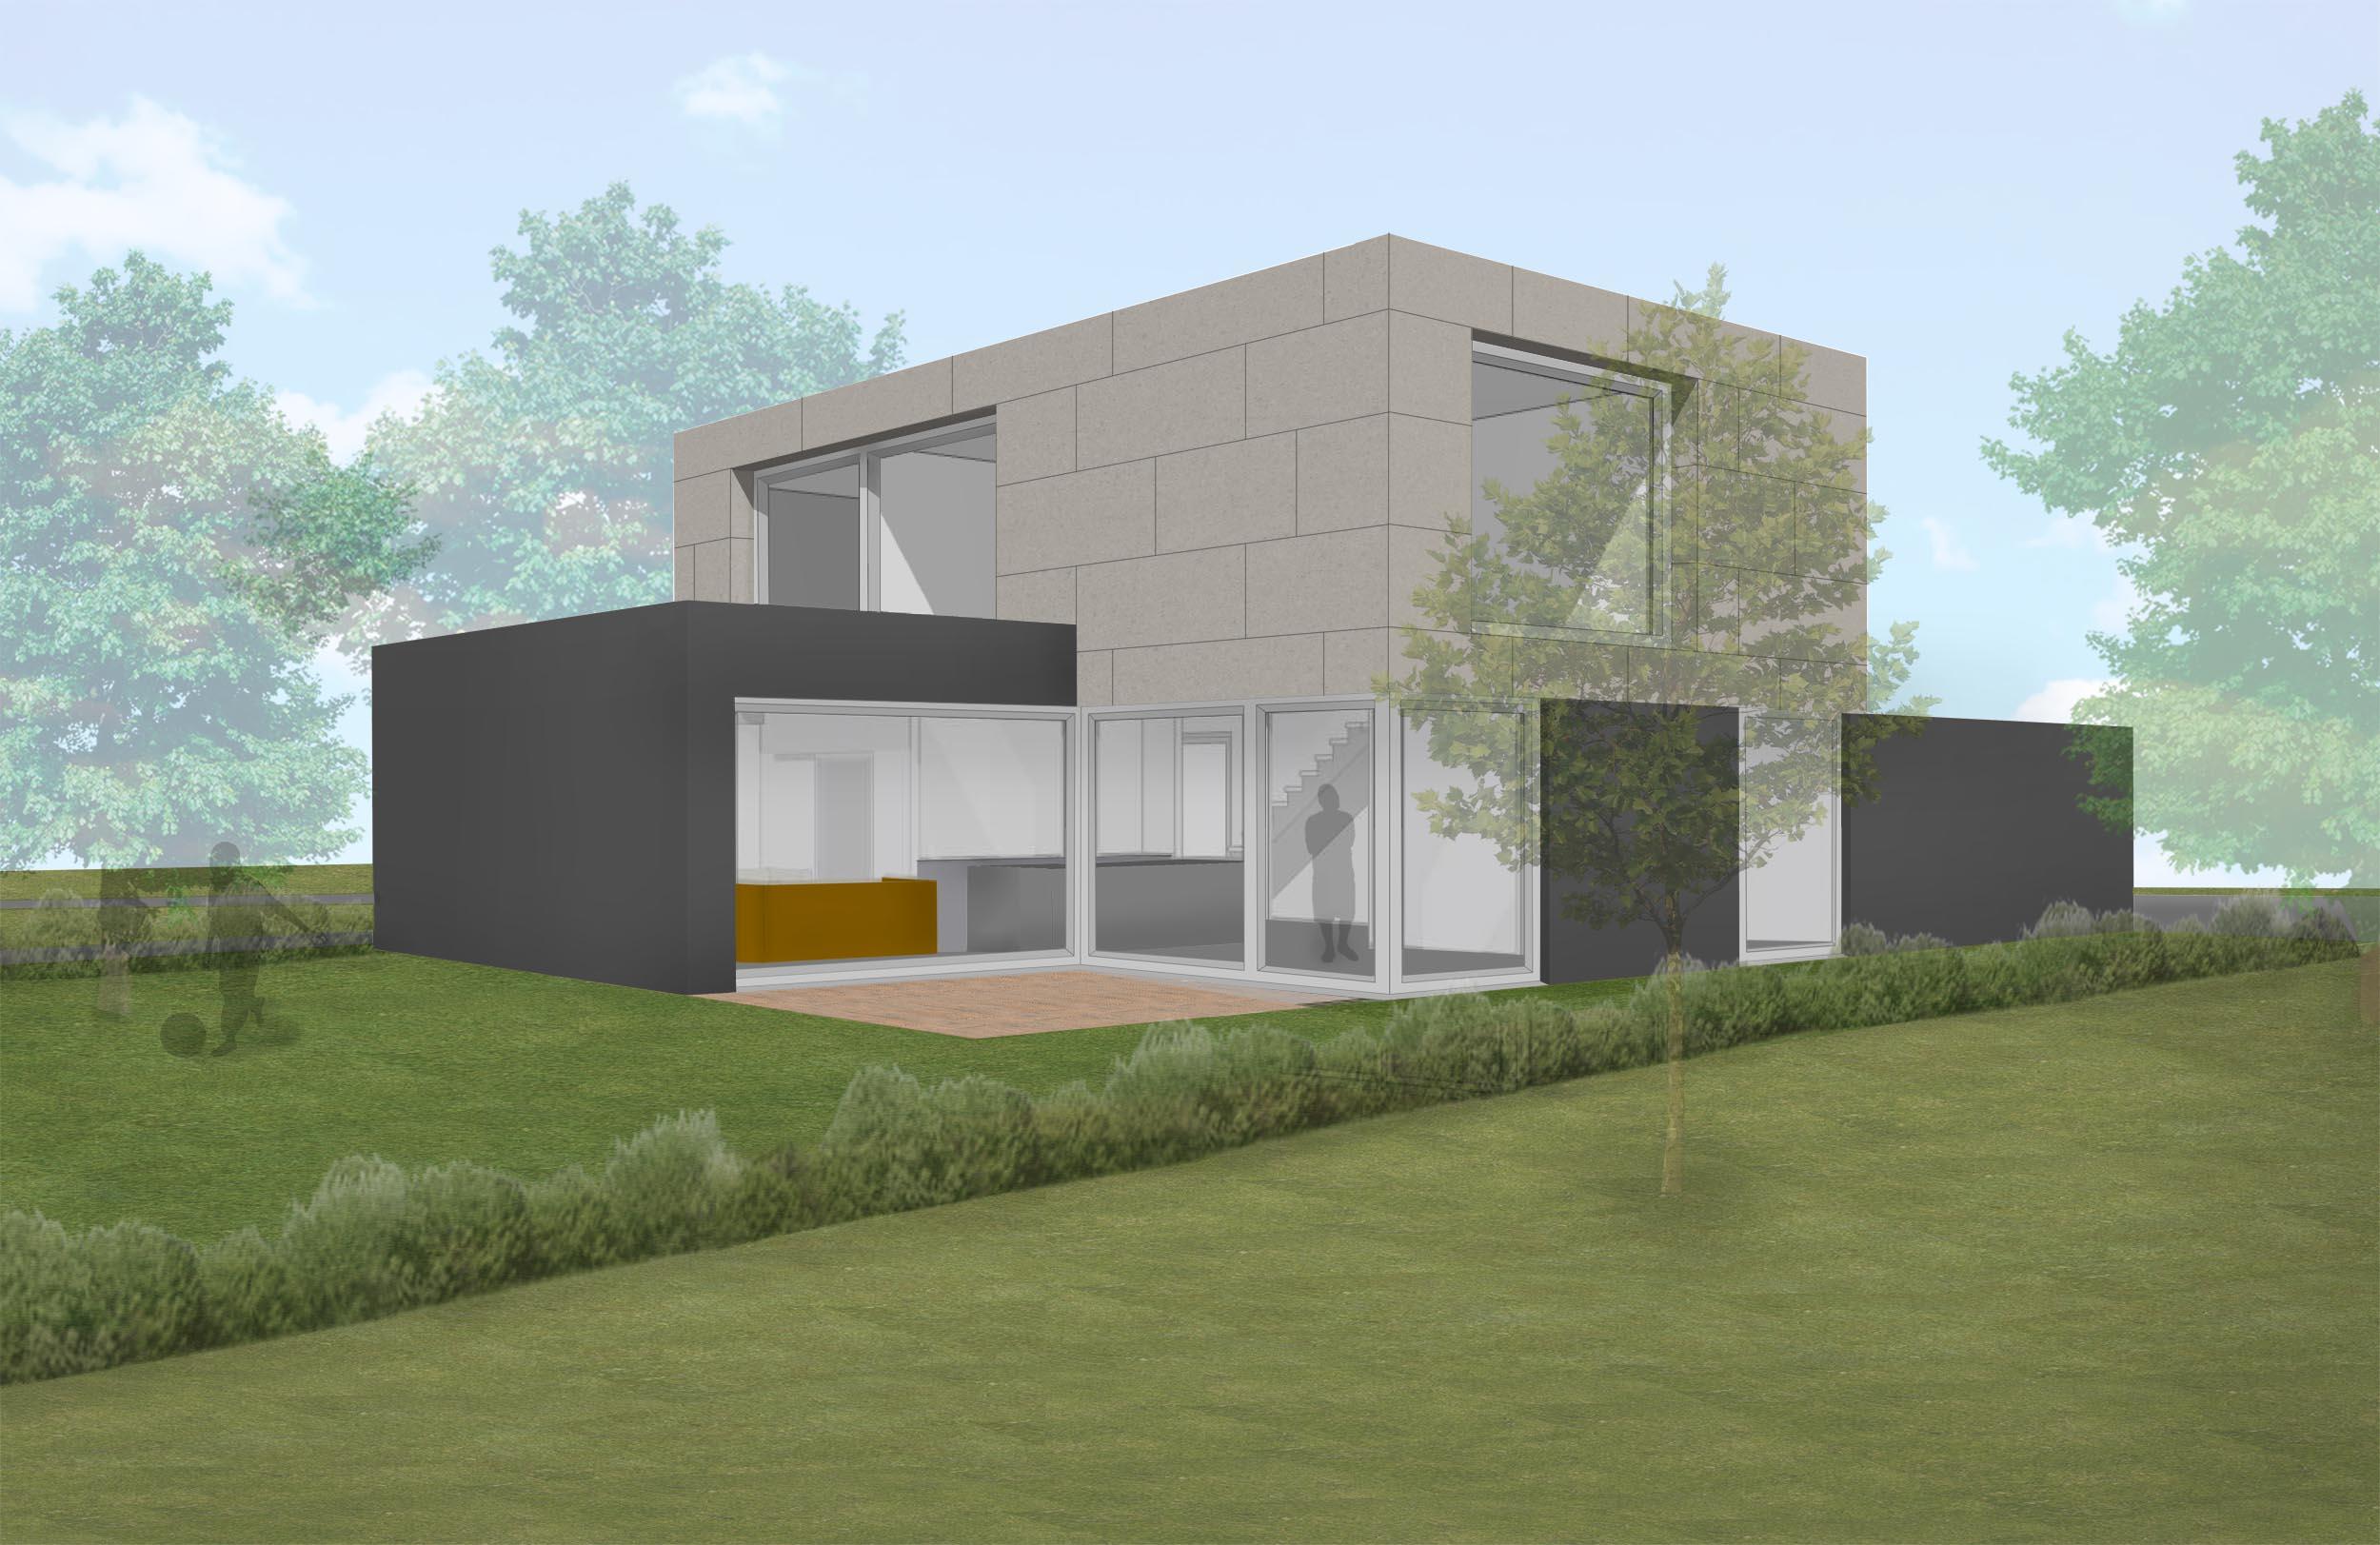 https://www.architectoo.de/images/584t.jpg